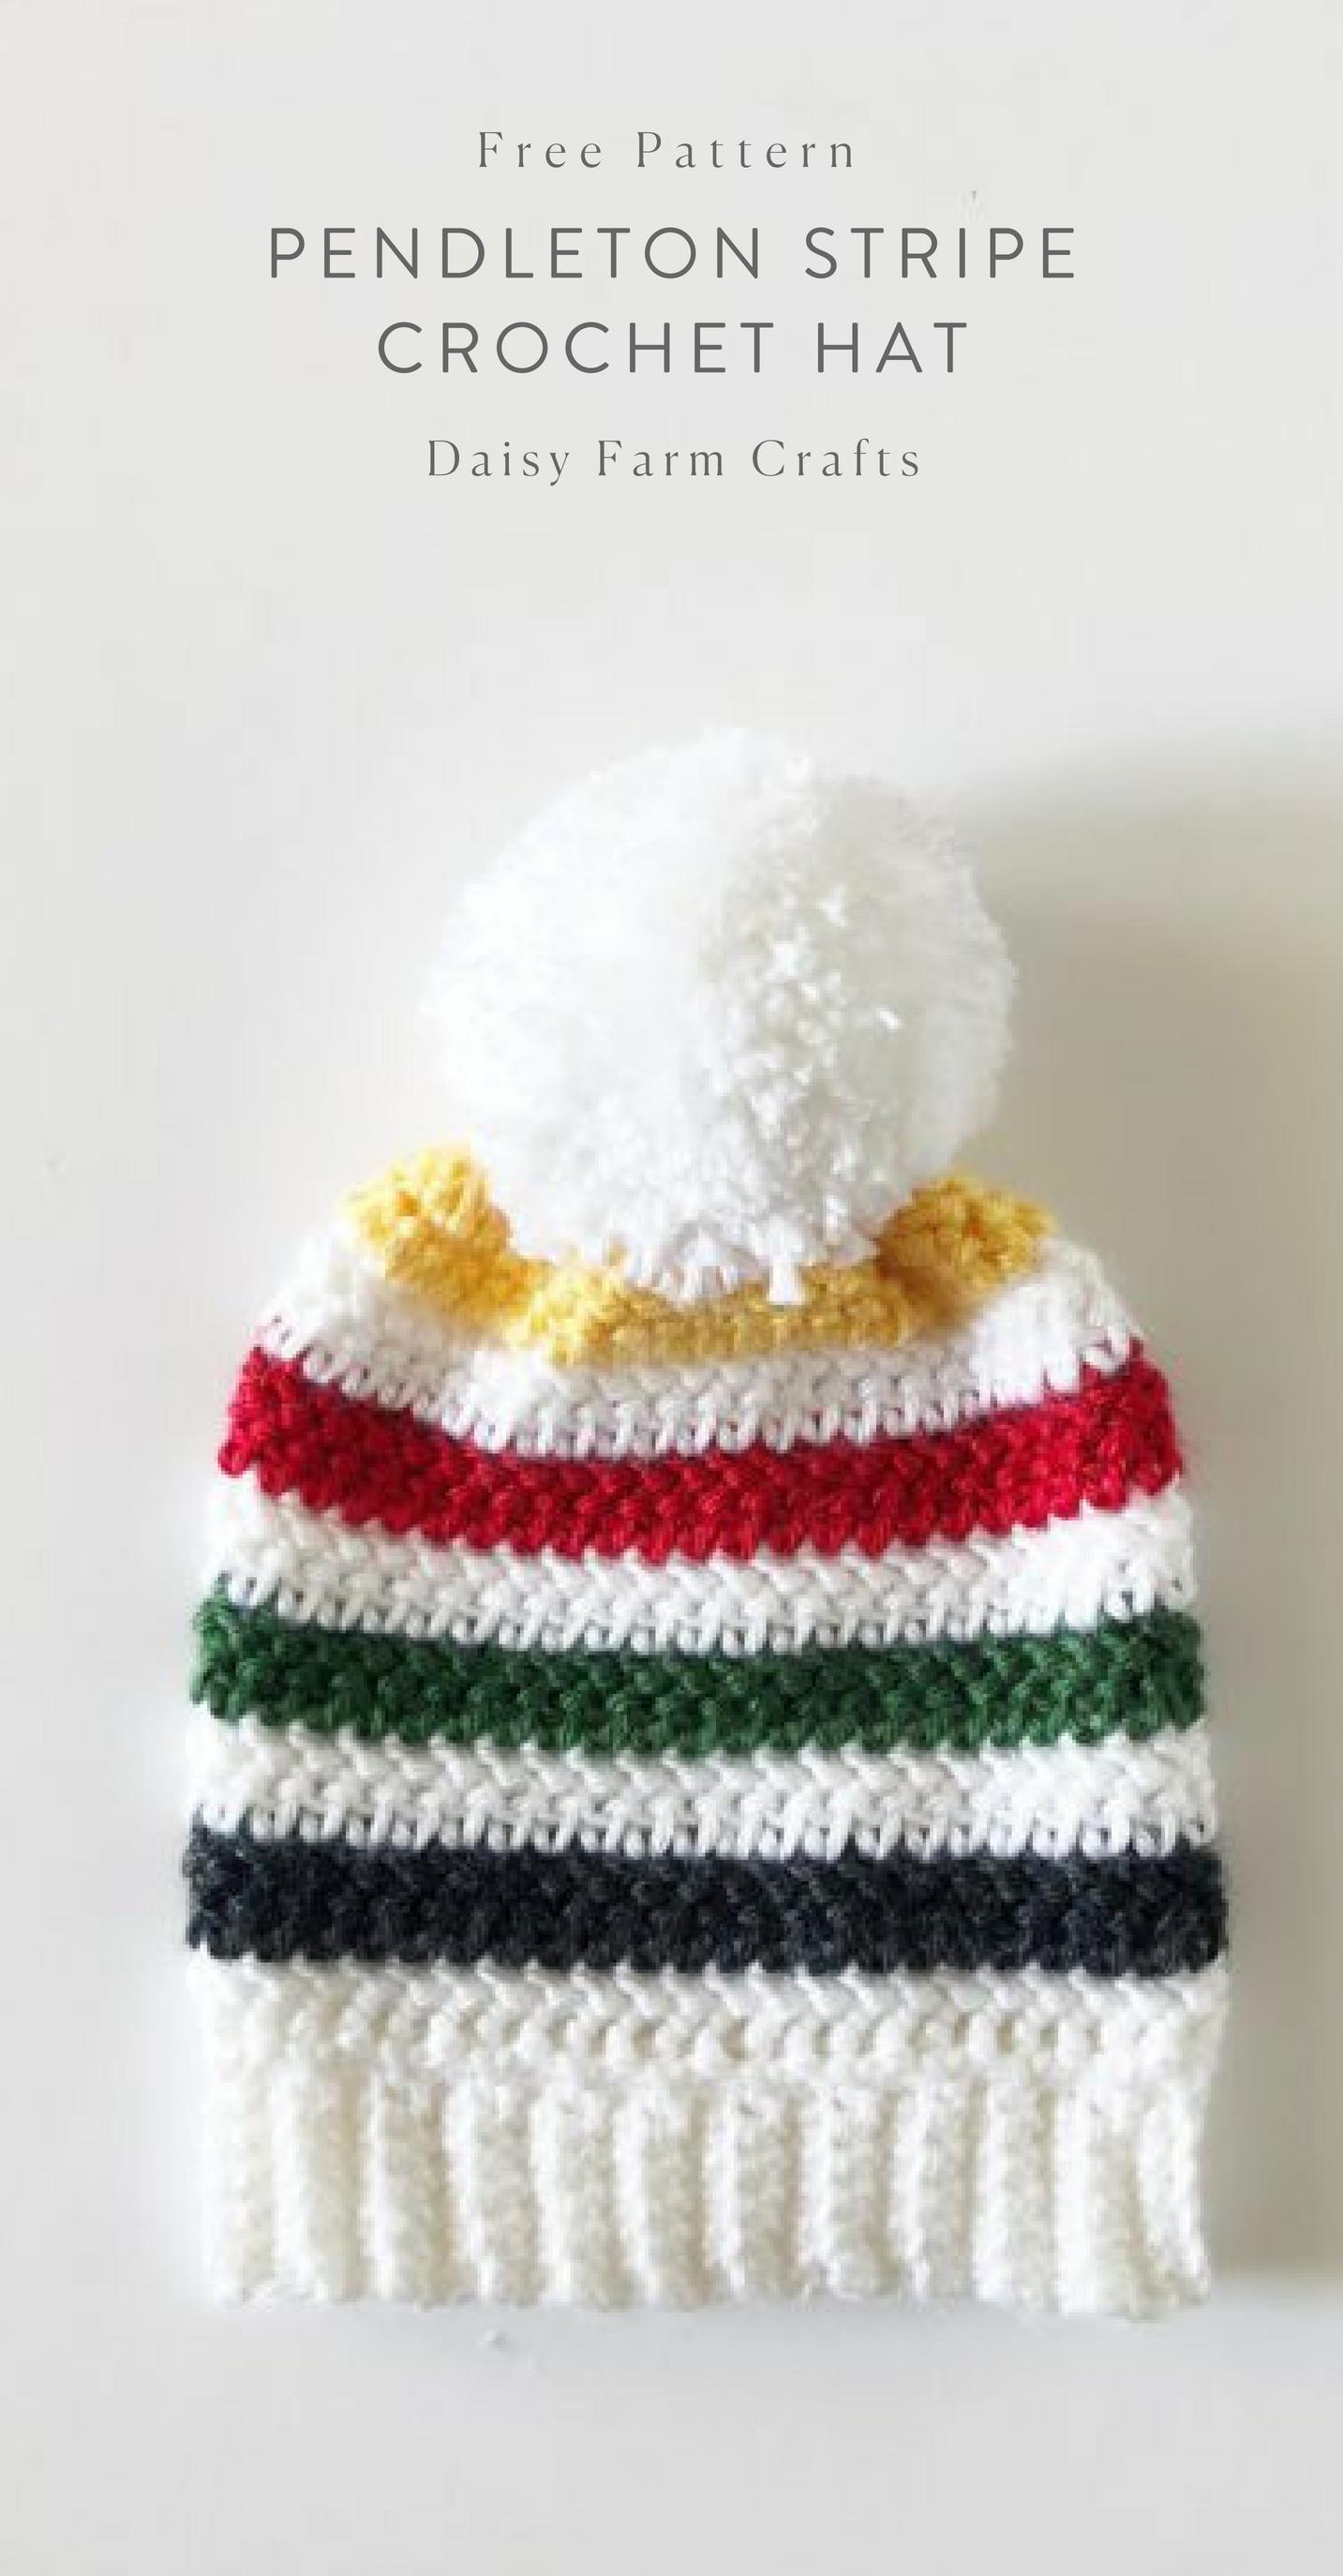 Free Pattern - Pendleton Stripe Crochet Hat   Tejidos   Pinterest ...